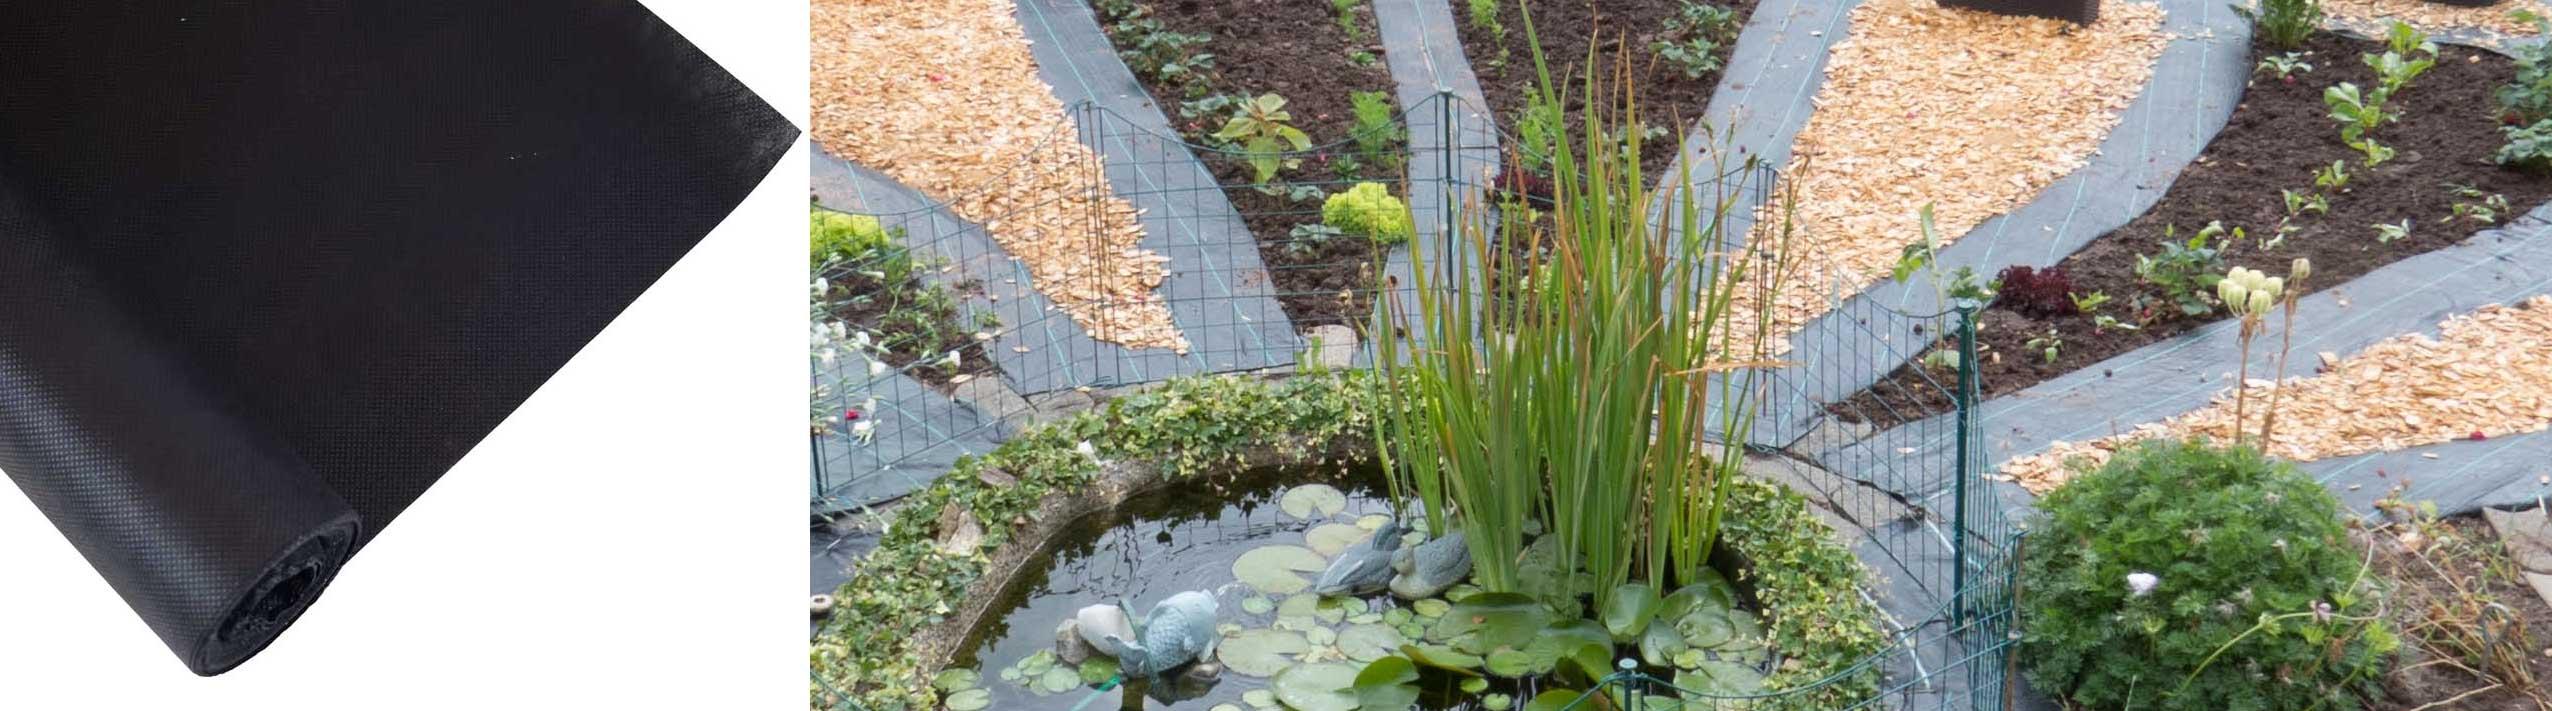 Gartenbauvlies